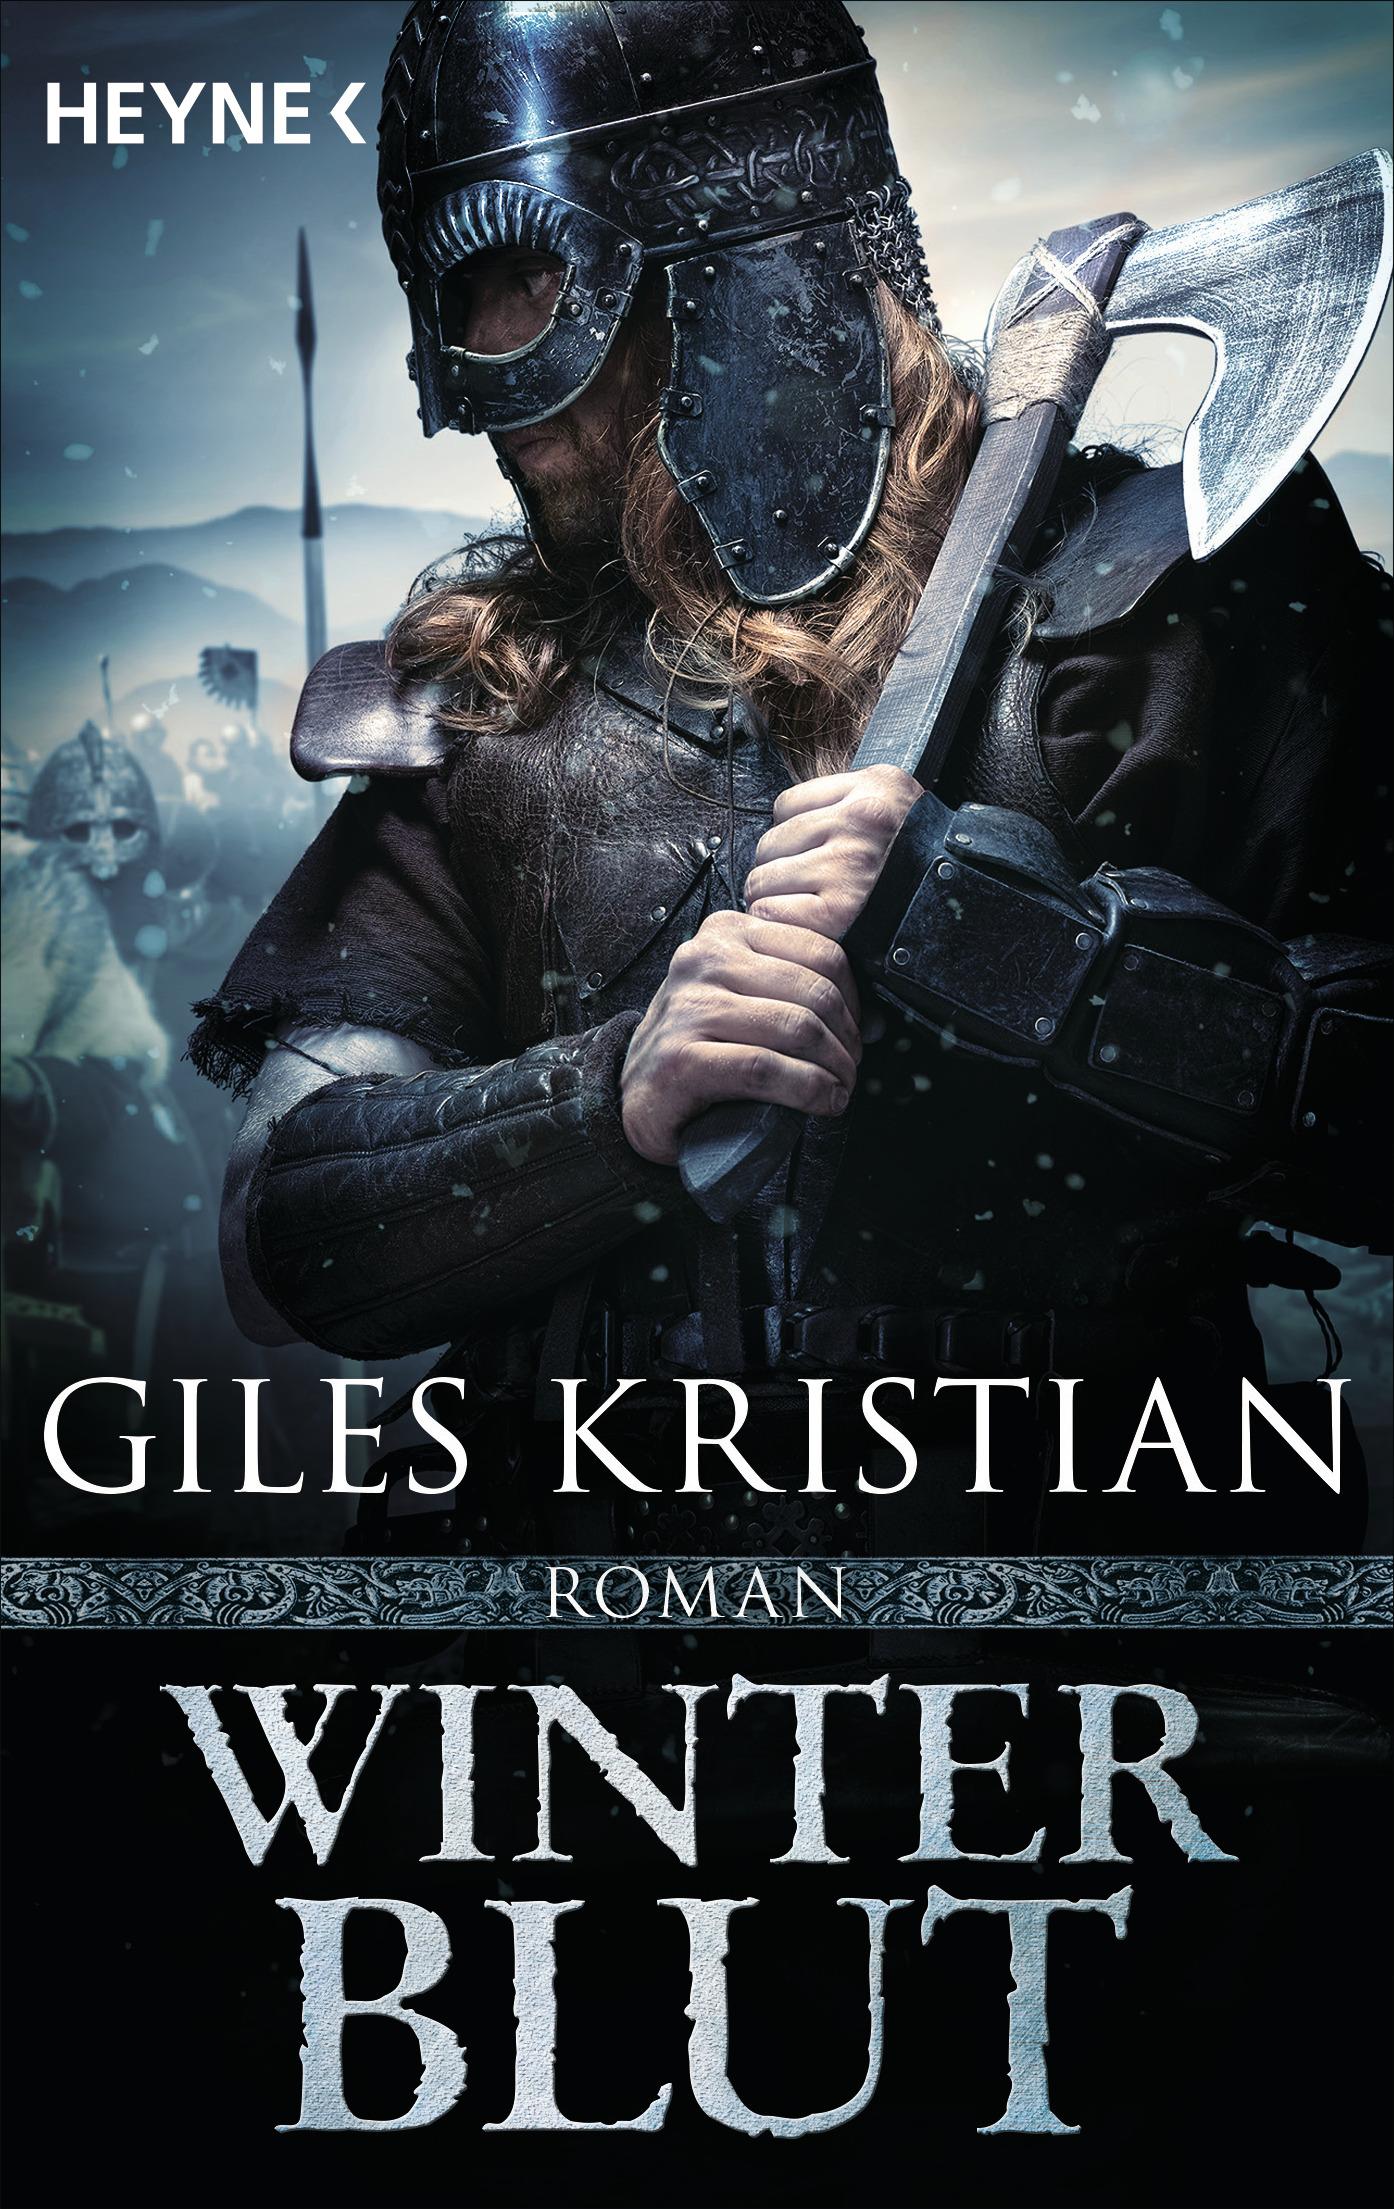 WinterblutSigurd Band 2 von Giles Kristian